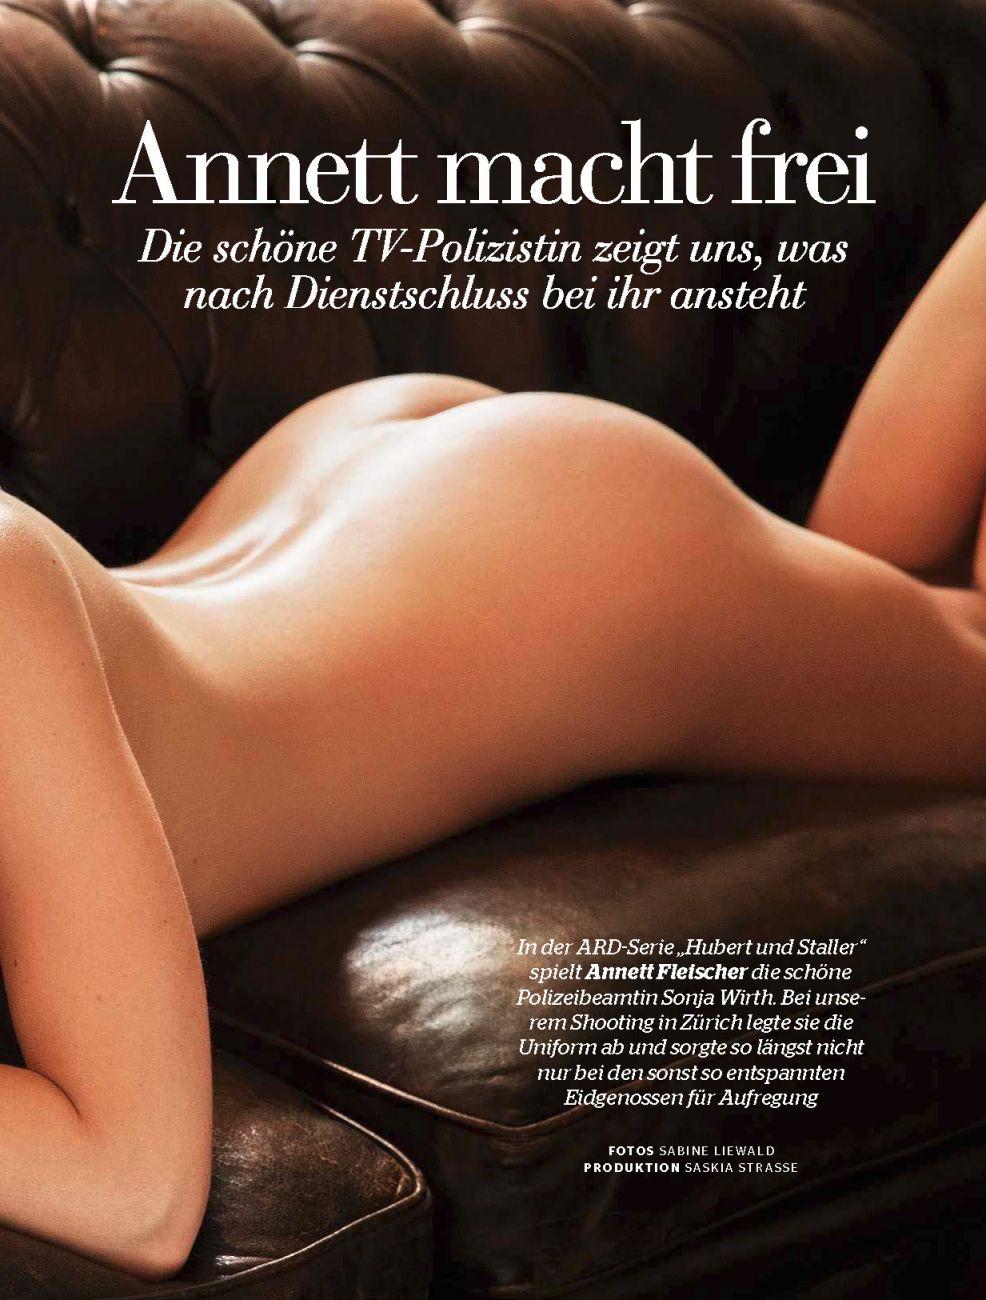 Annett Fletcher